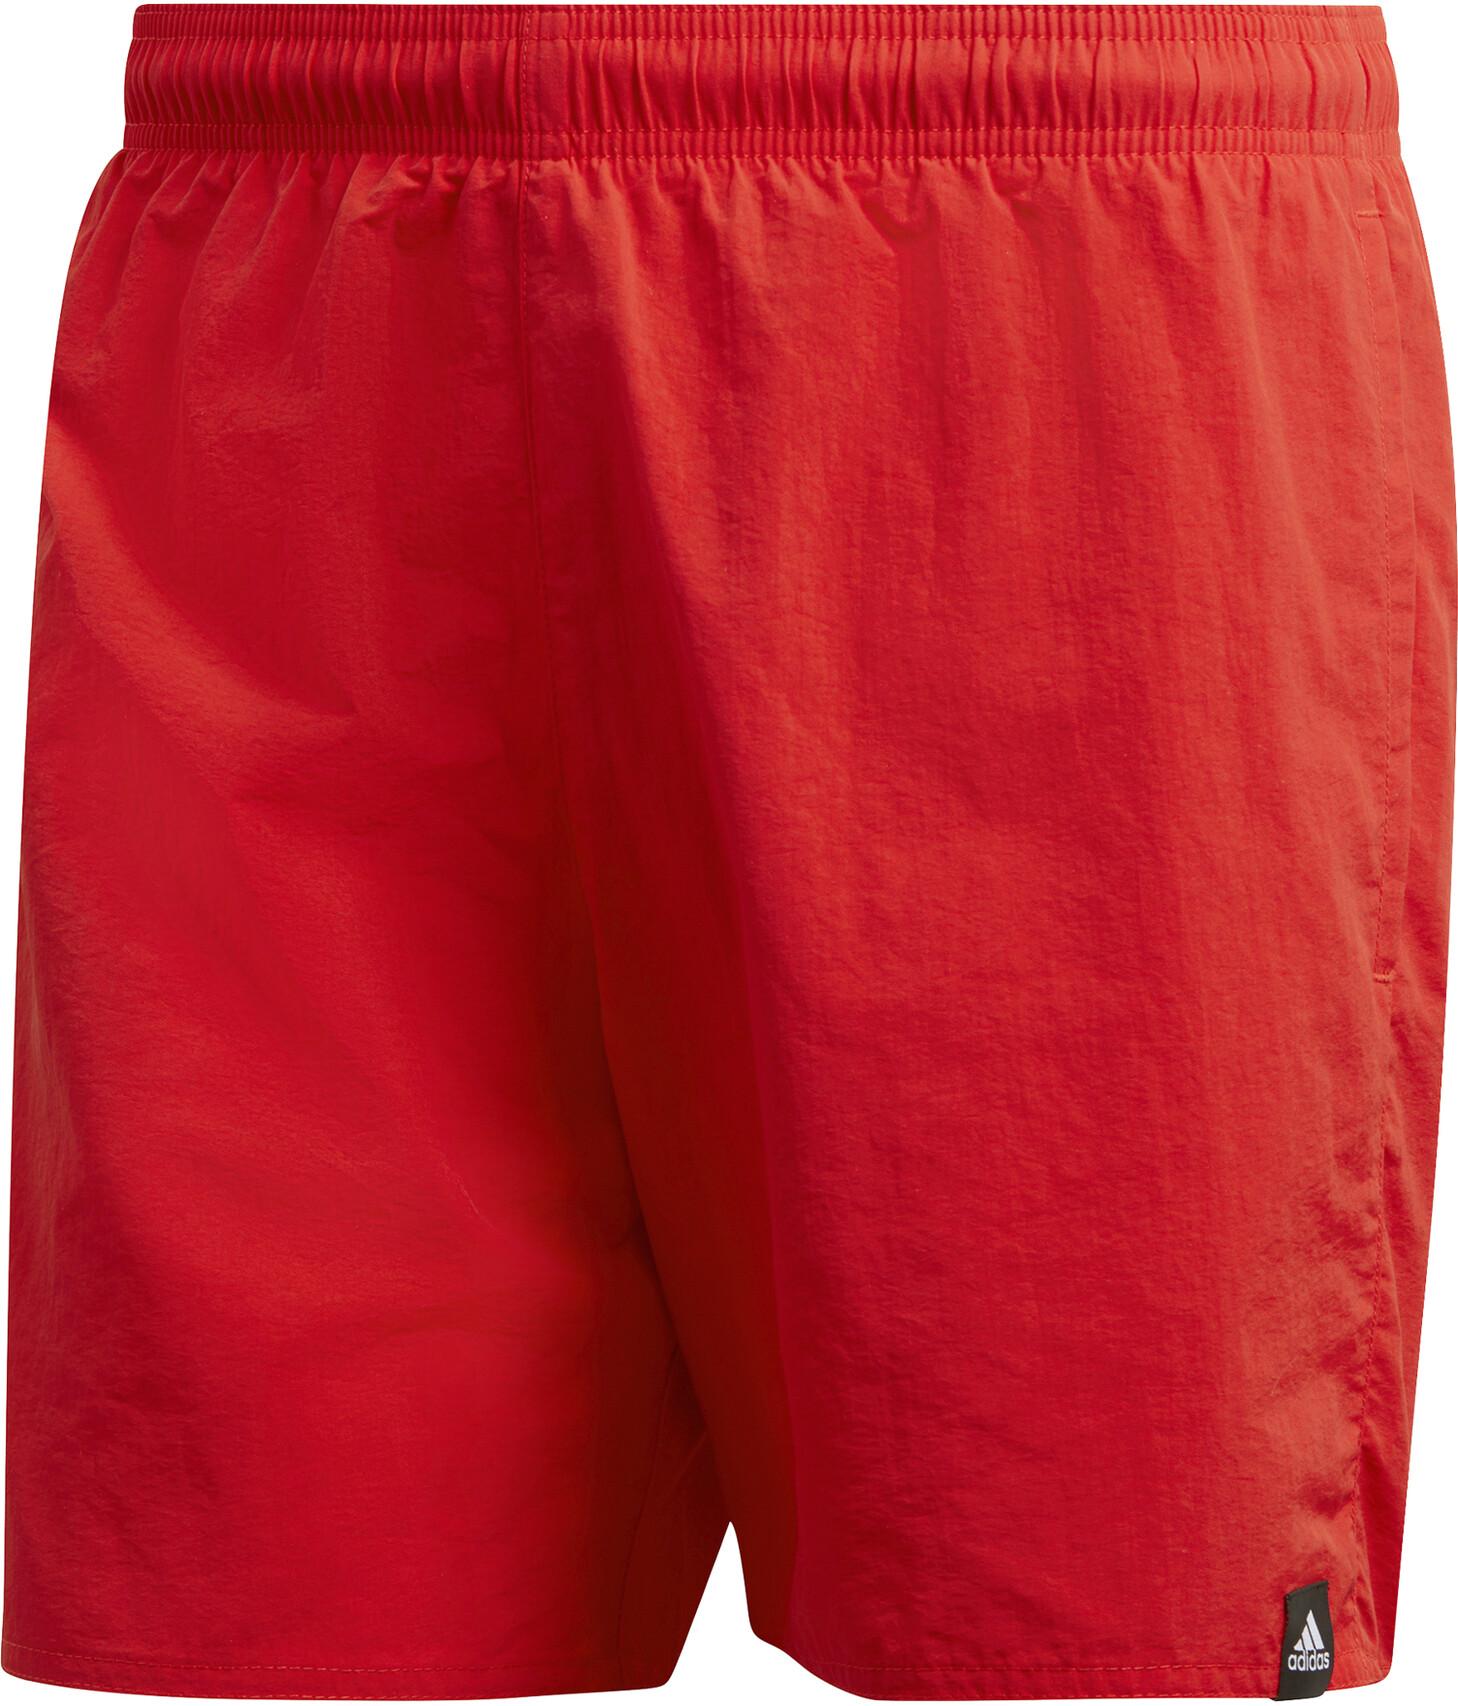 adidas Solid SL Shorts Herrer, active orange (2019)   swim_clothes